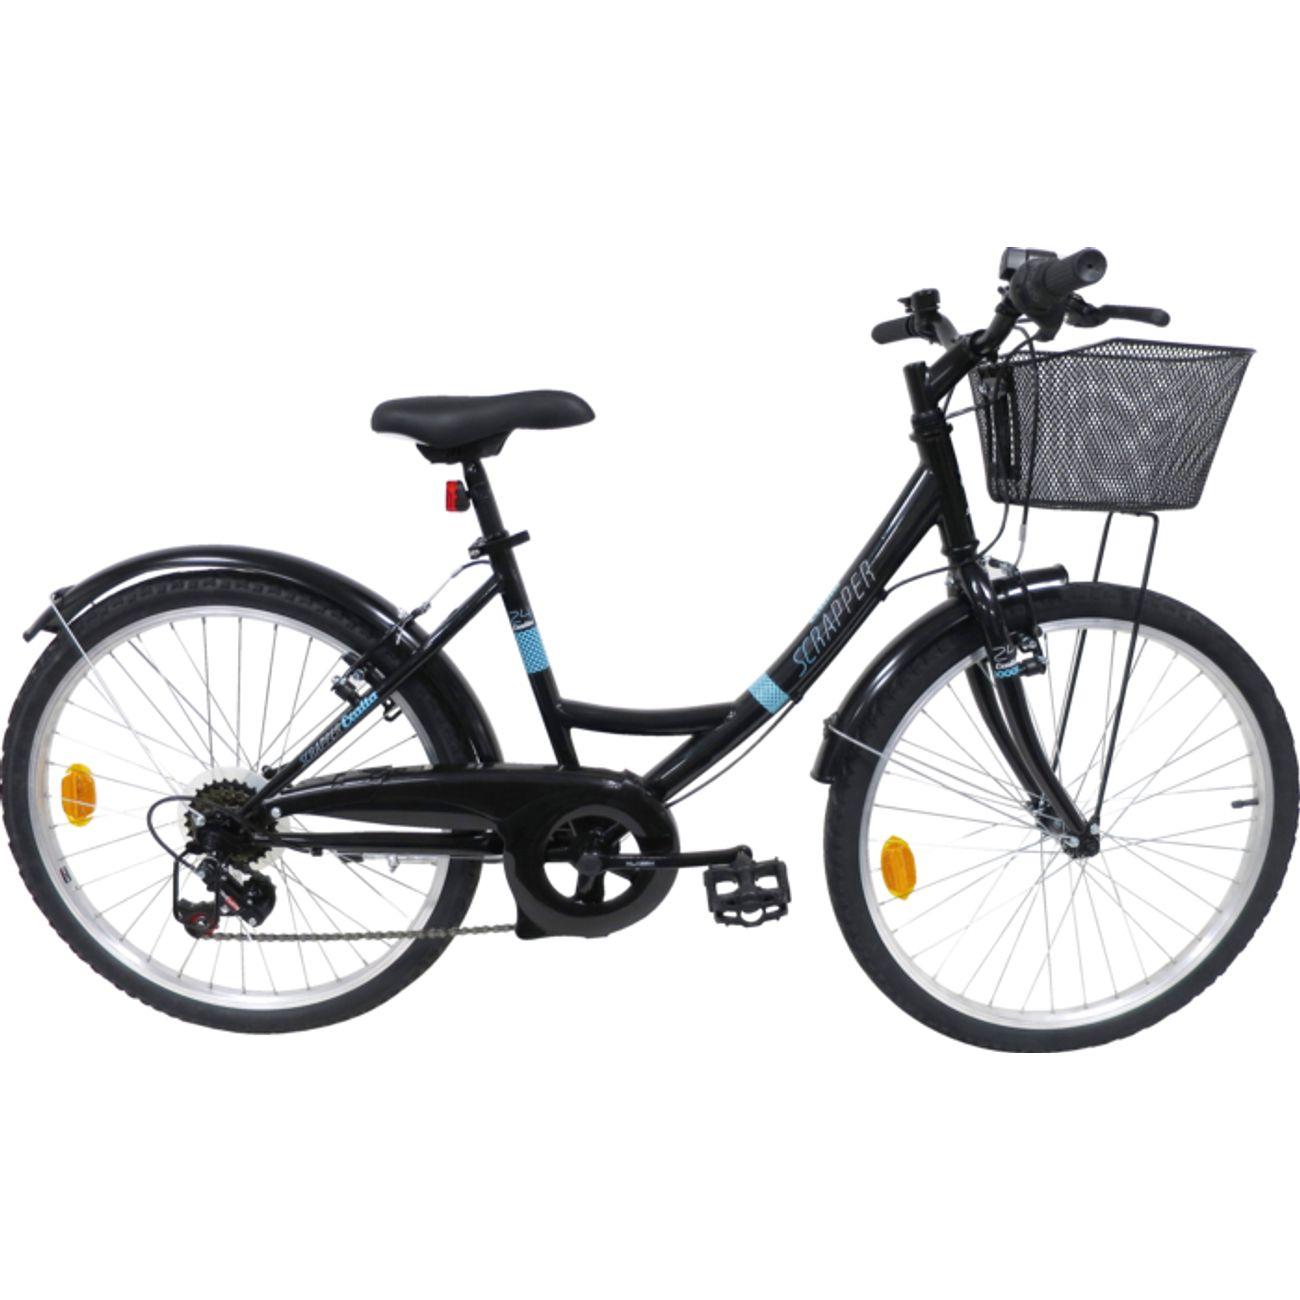 VELO Vélo  SCRAPPER EXALTA 24 CITY 1.4